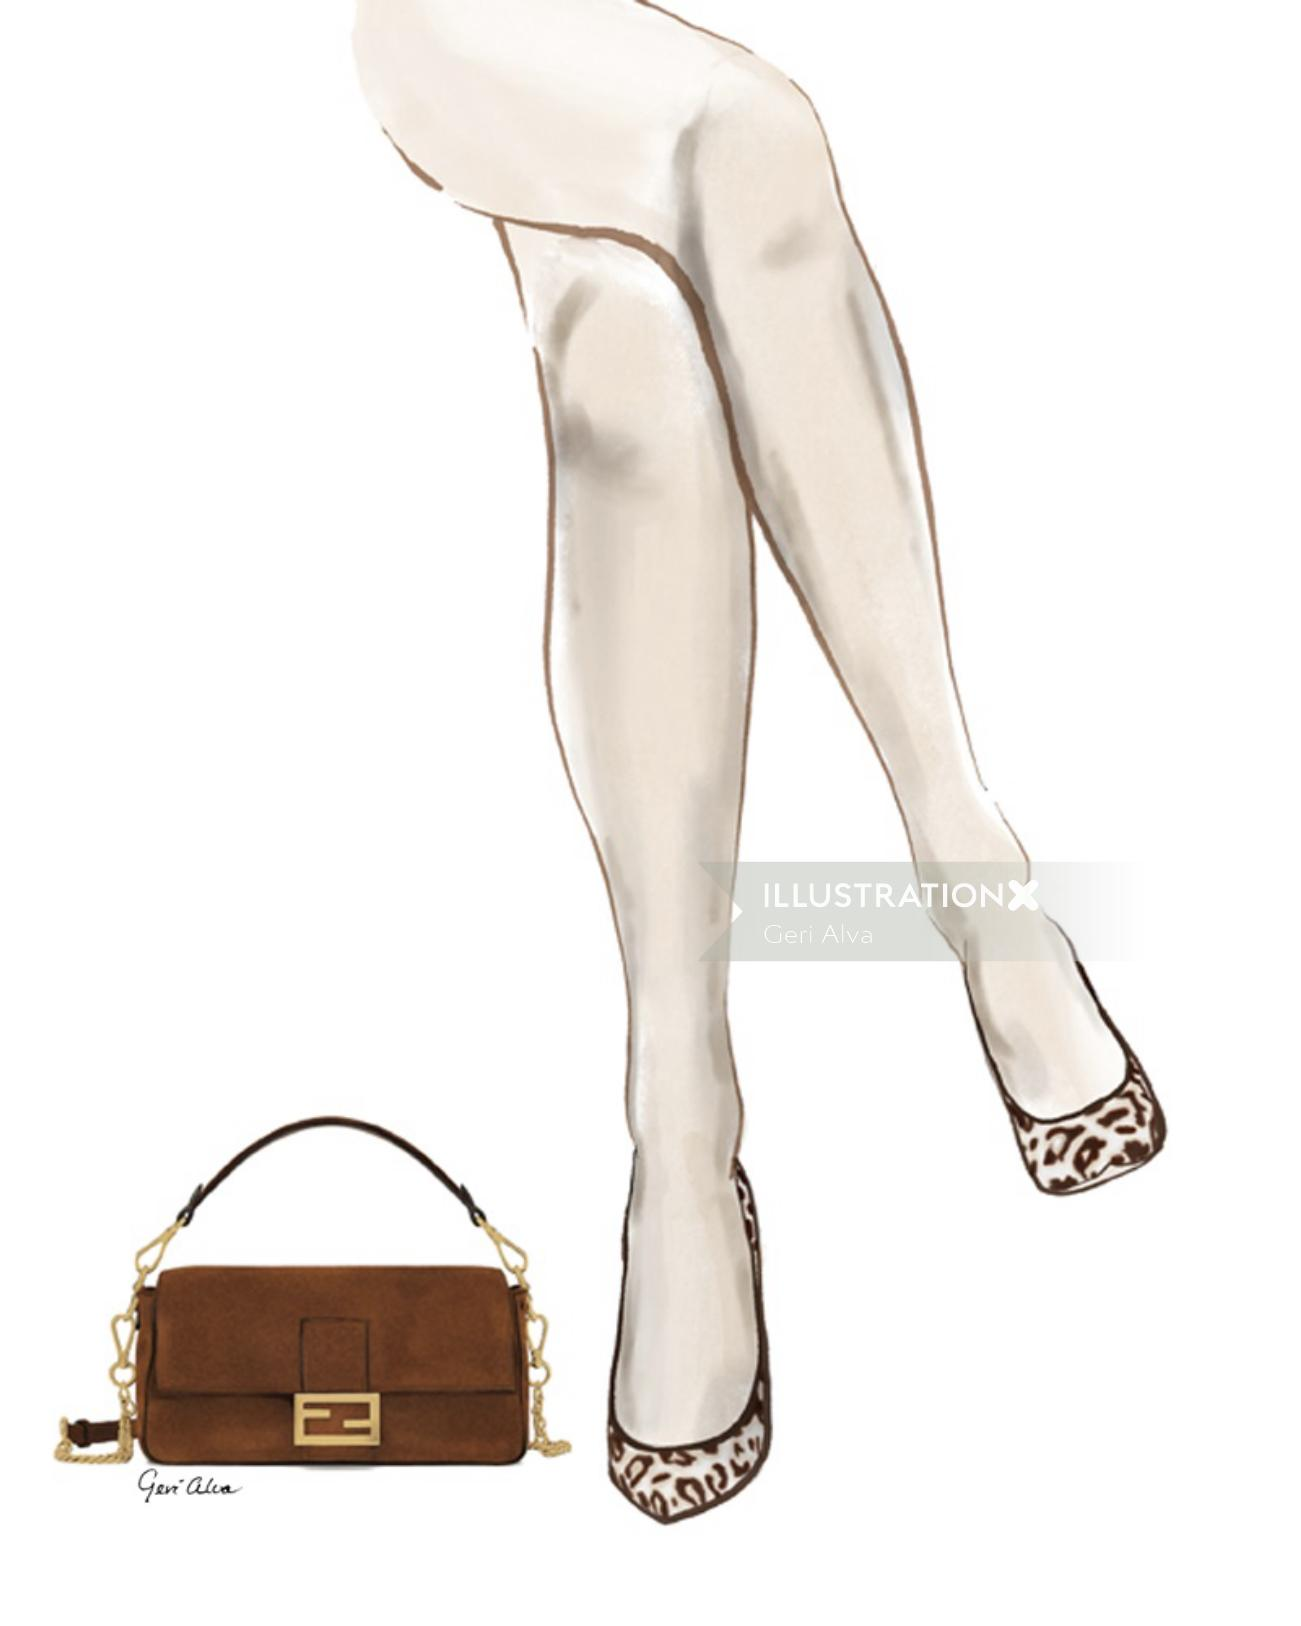 Beauty illustration of Fendi Purse and Cheetah Pumps